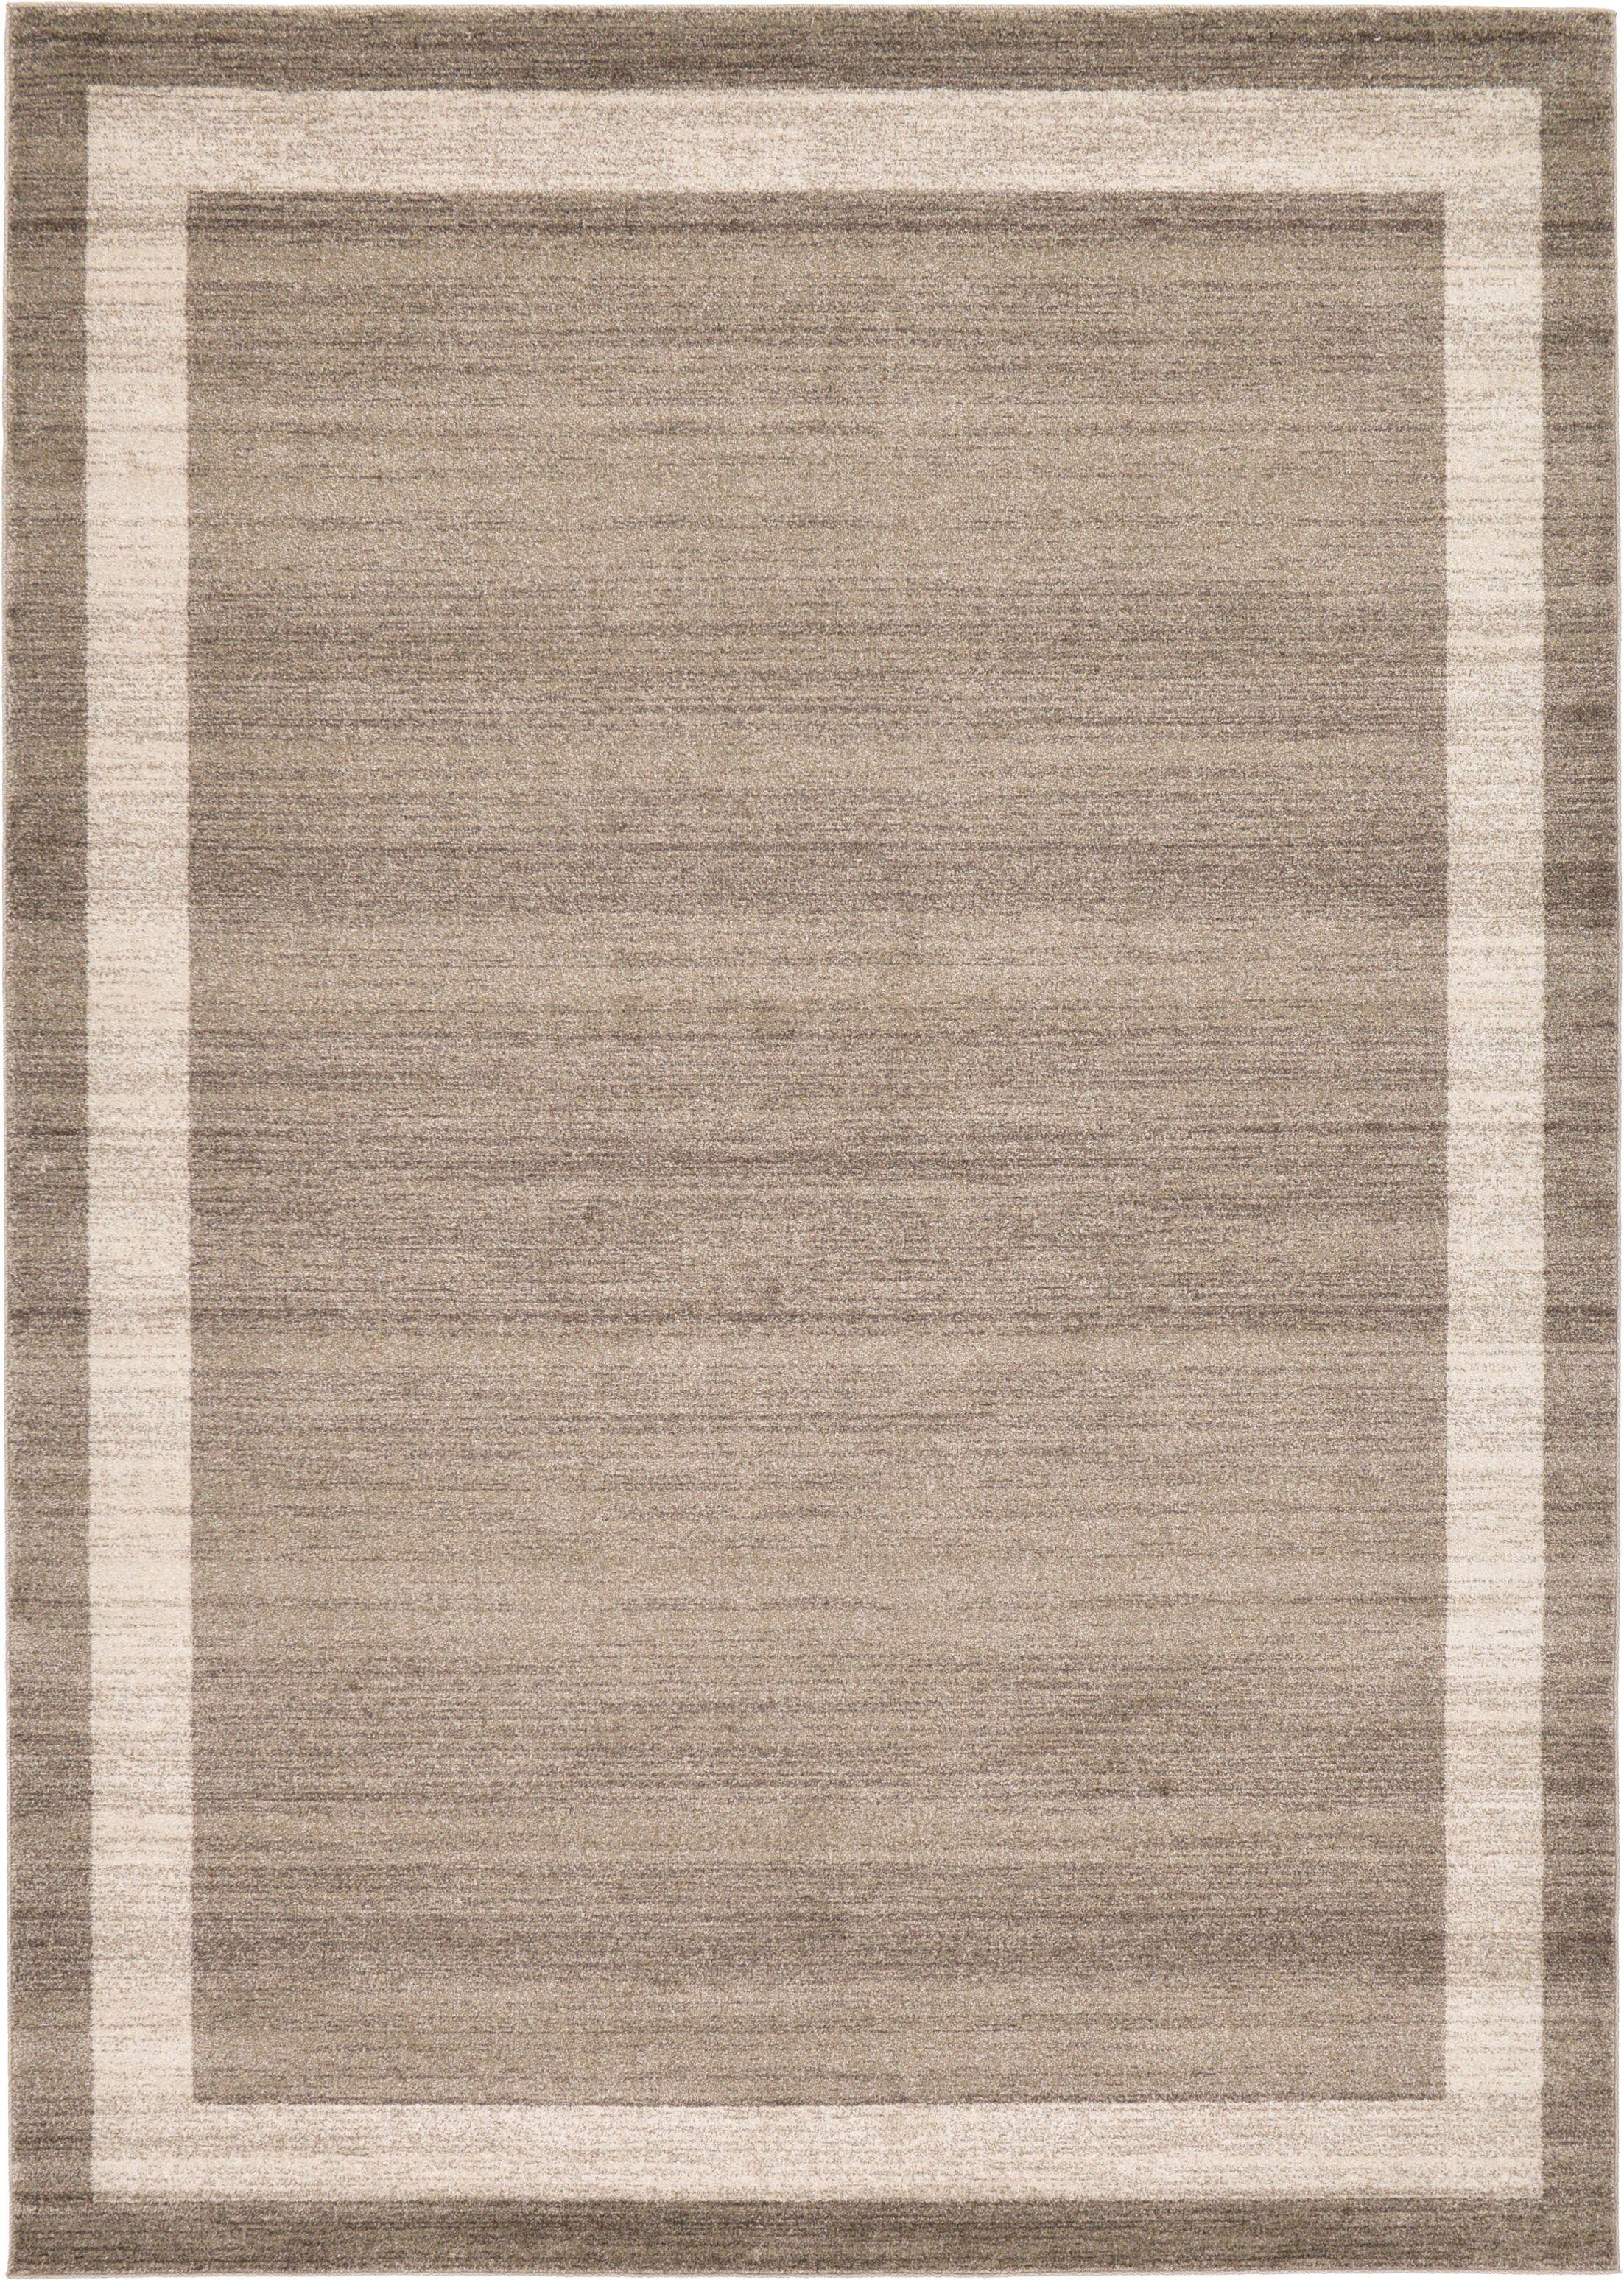 Christi Brown/Beige Area Rug Rug Size: Rectangle 8' x 11